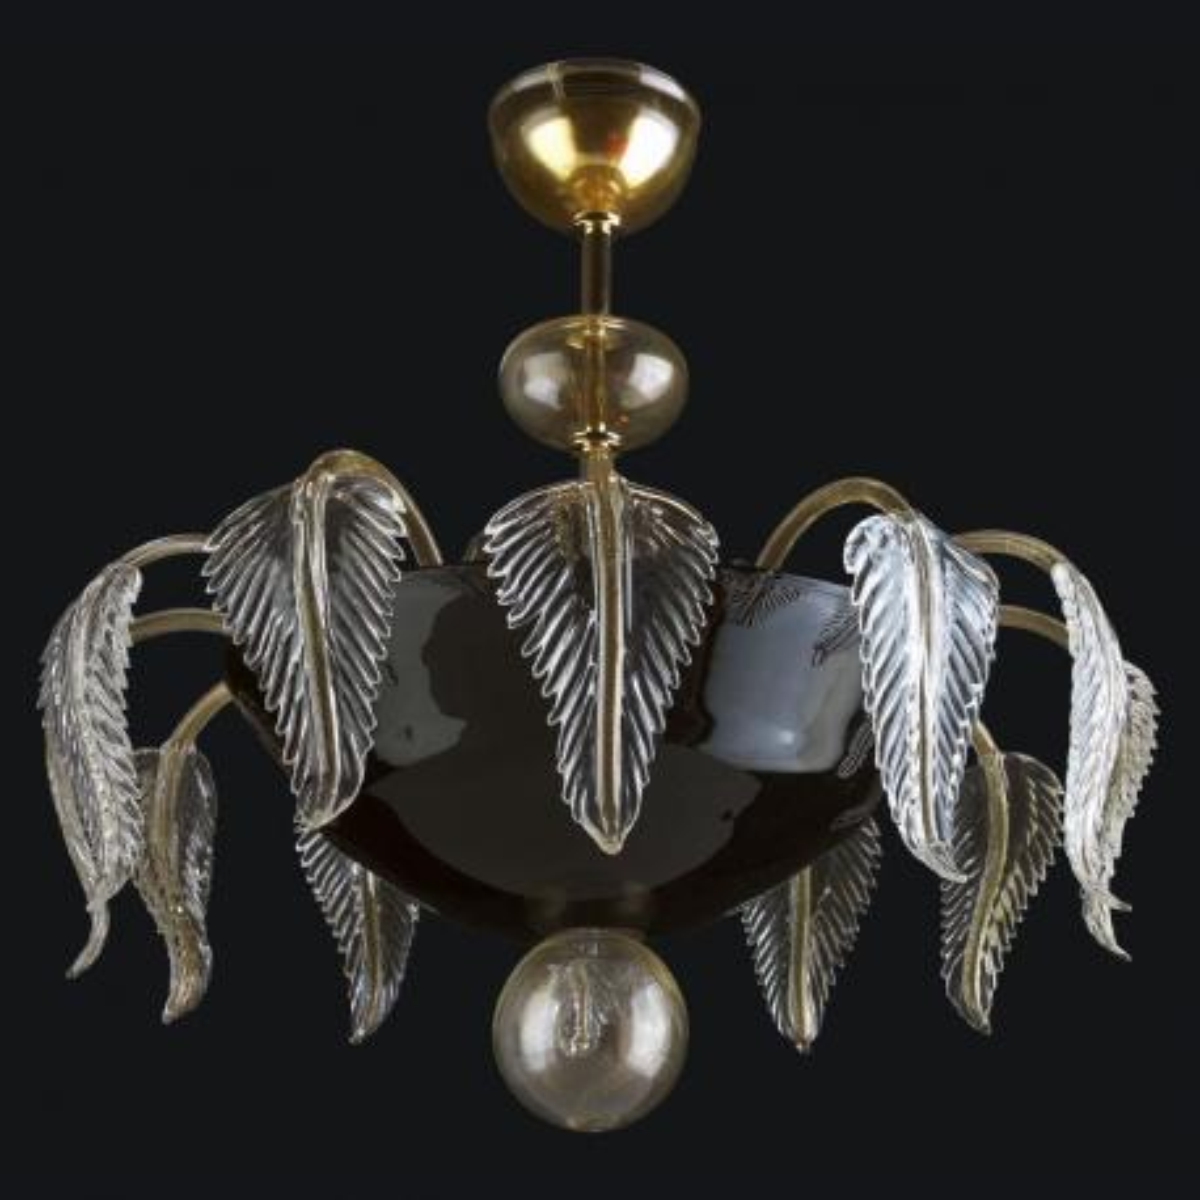 """Jaeden"" plafonnier en verre de Murano - 6 lumières - noir et or"